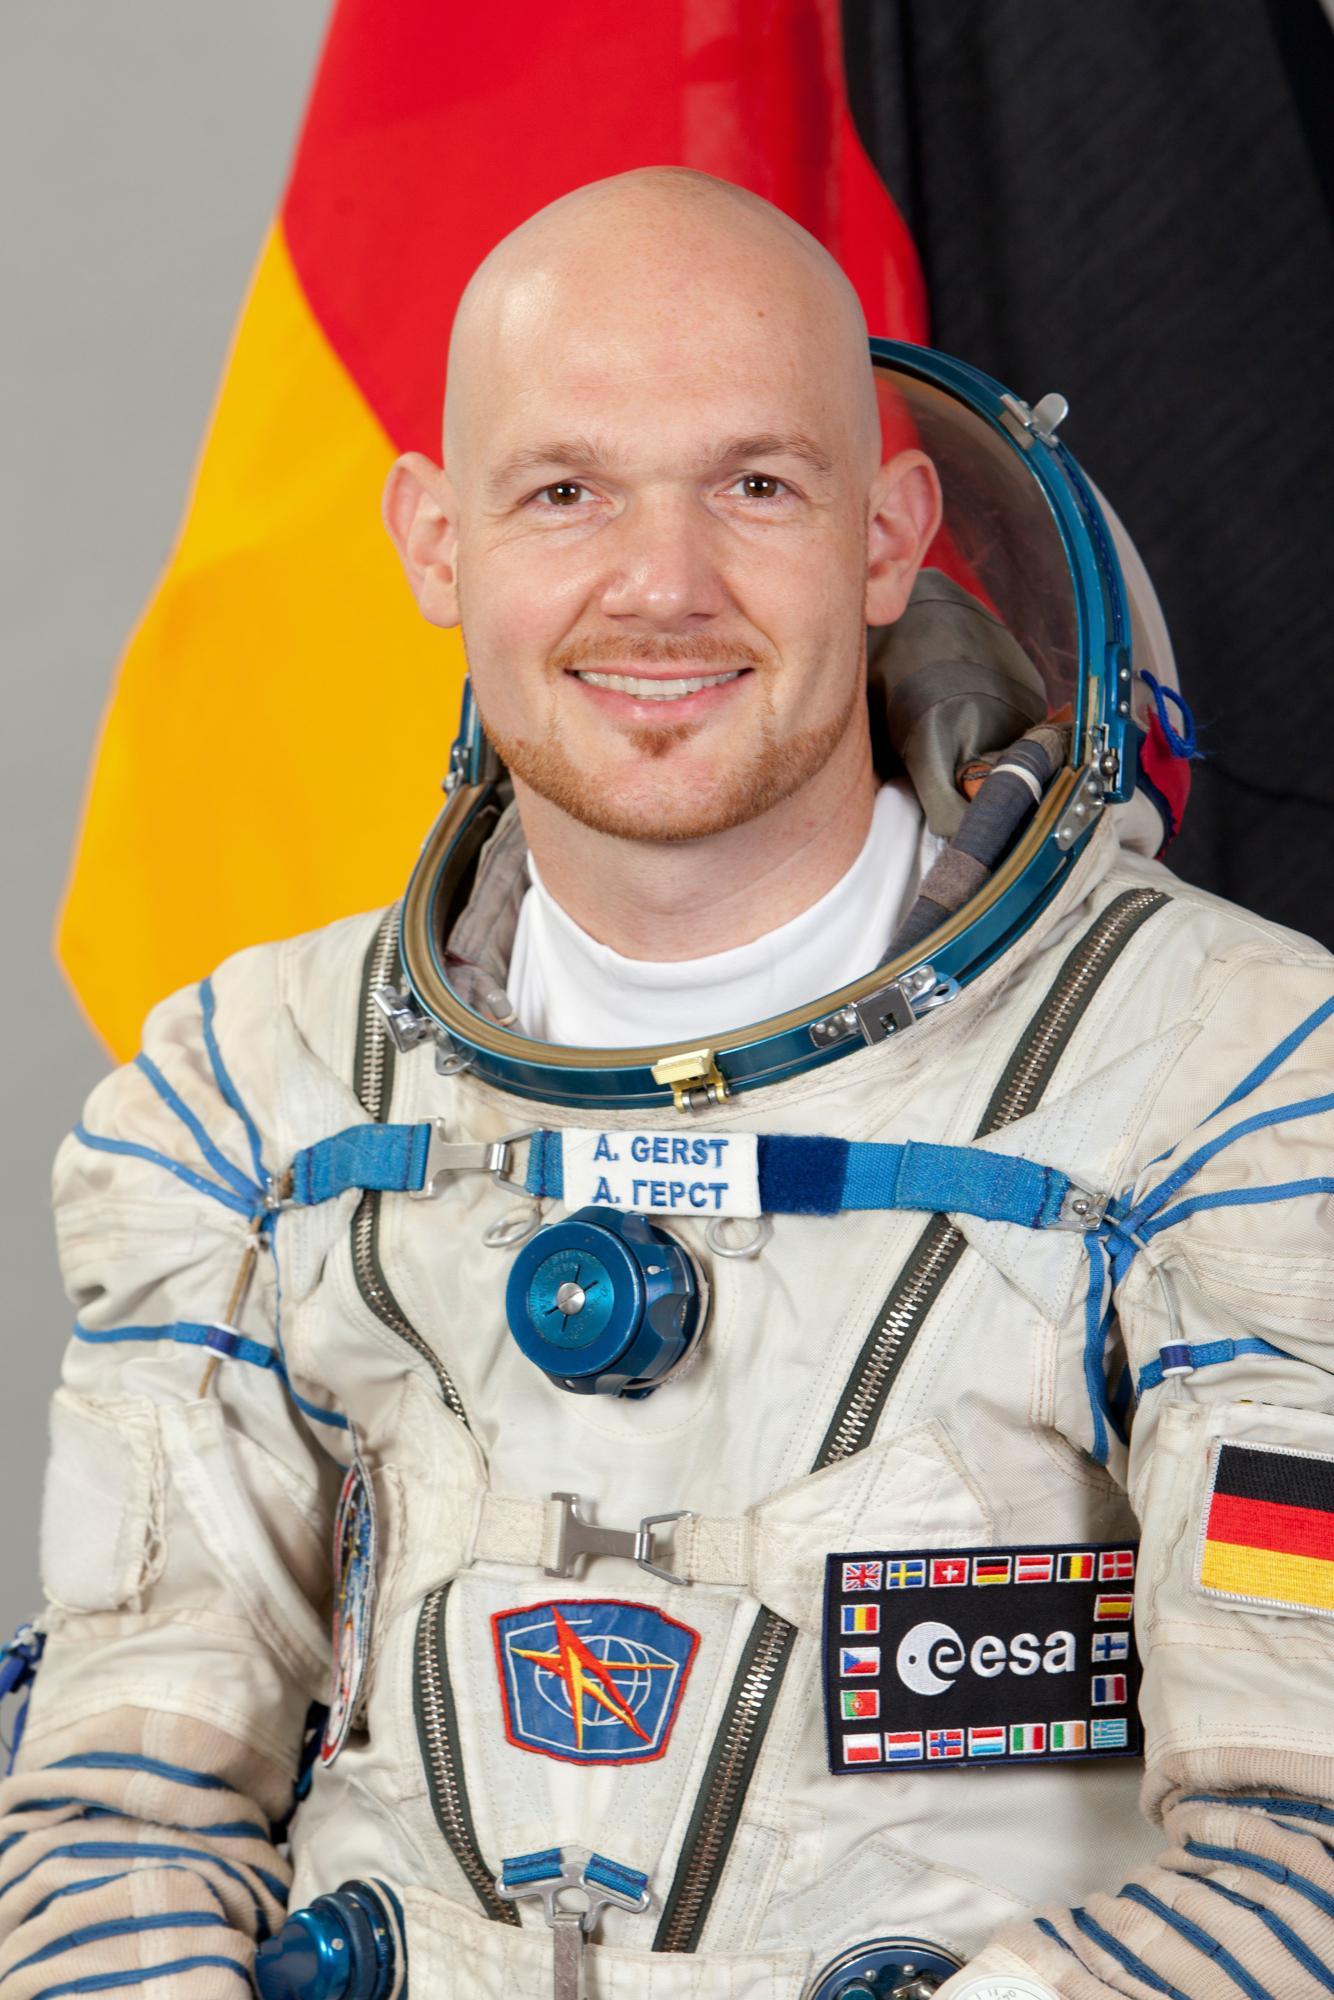 astronaut space crusade berlin - photo #22